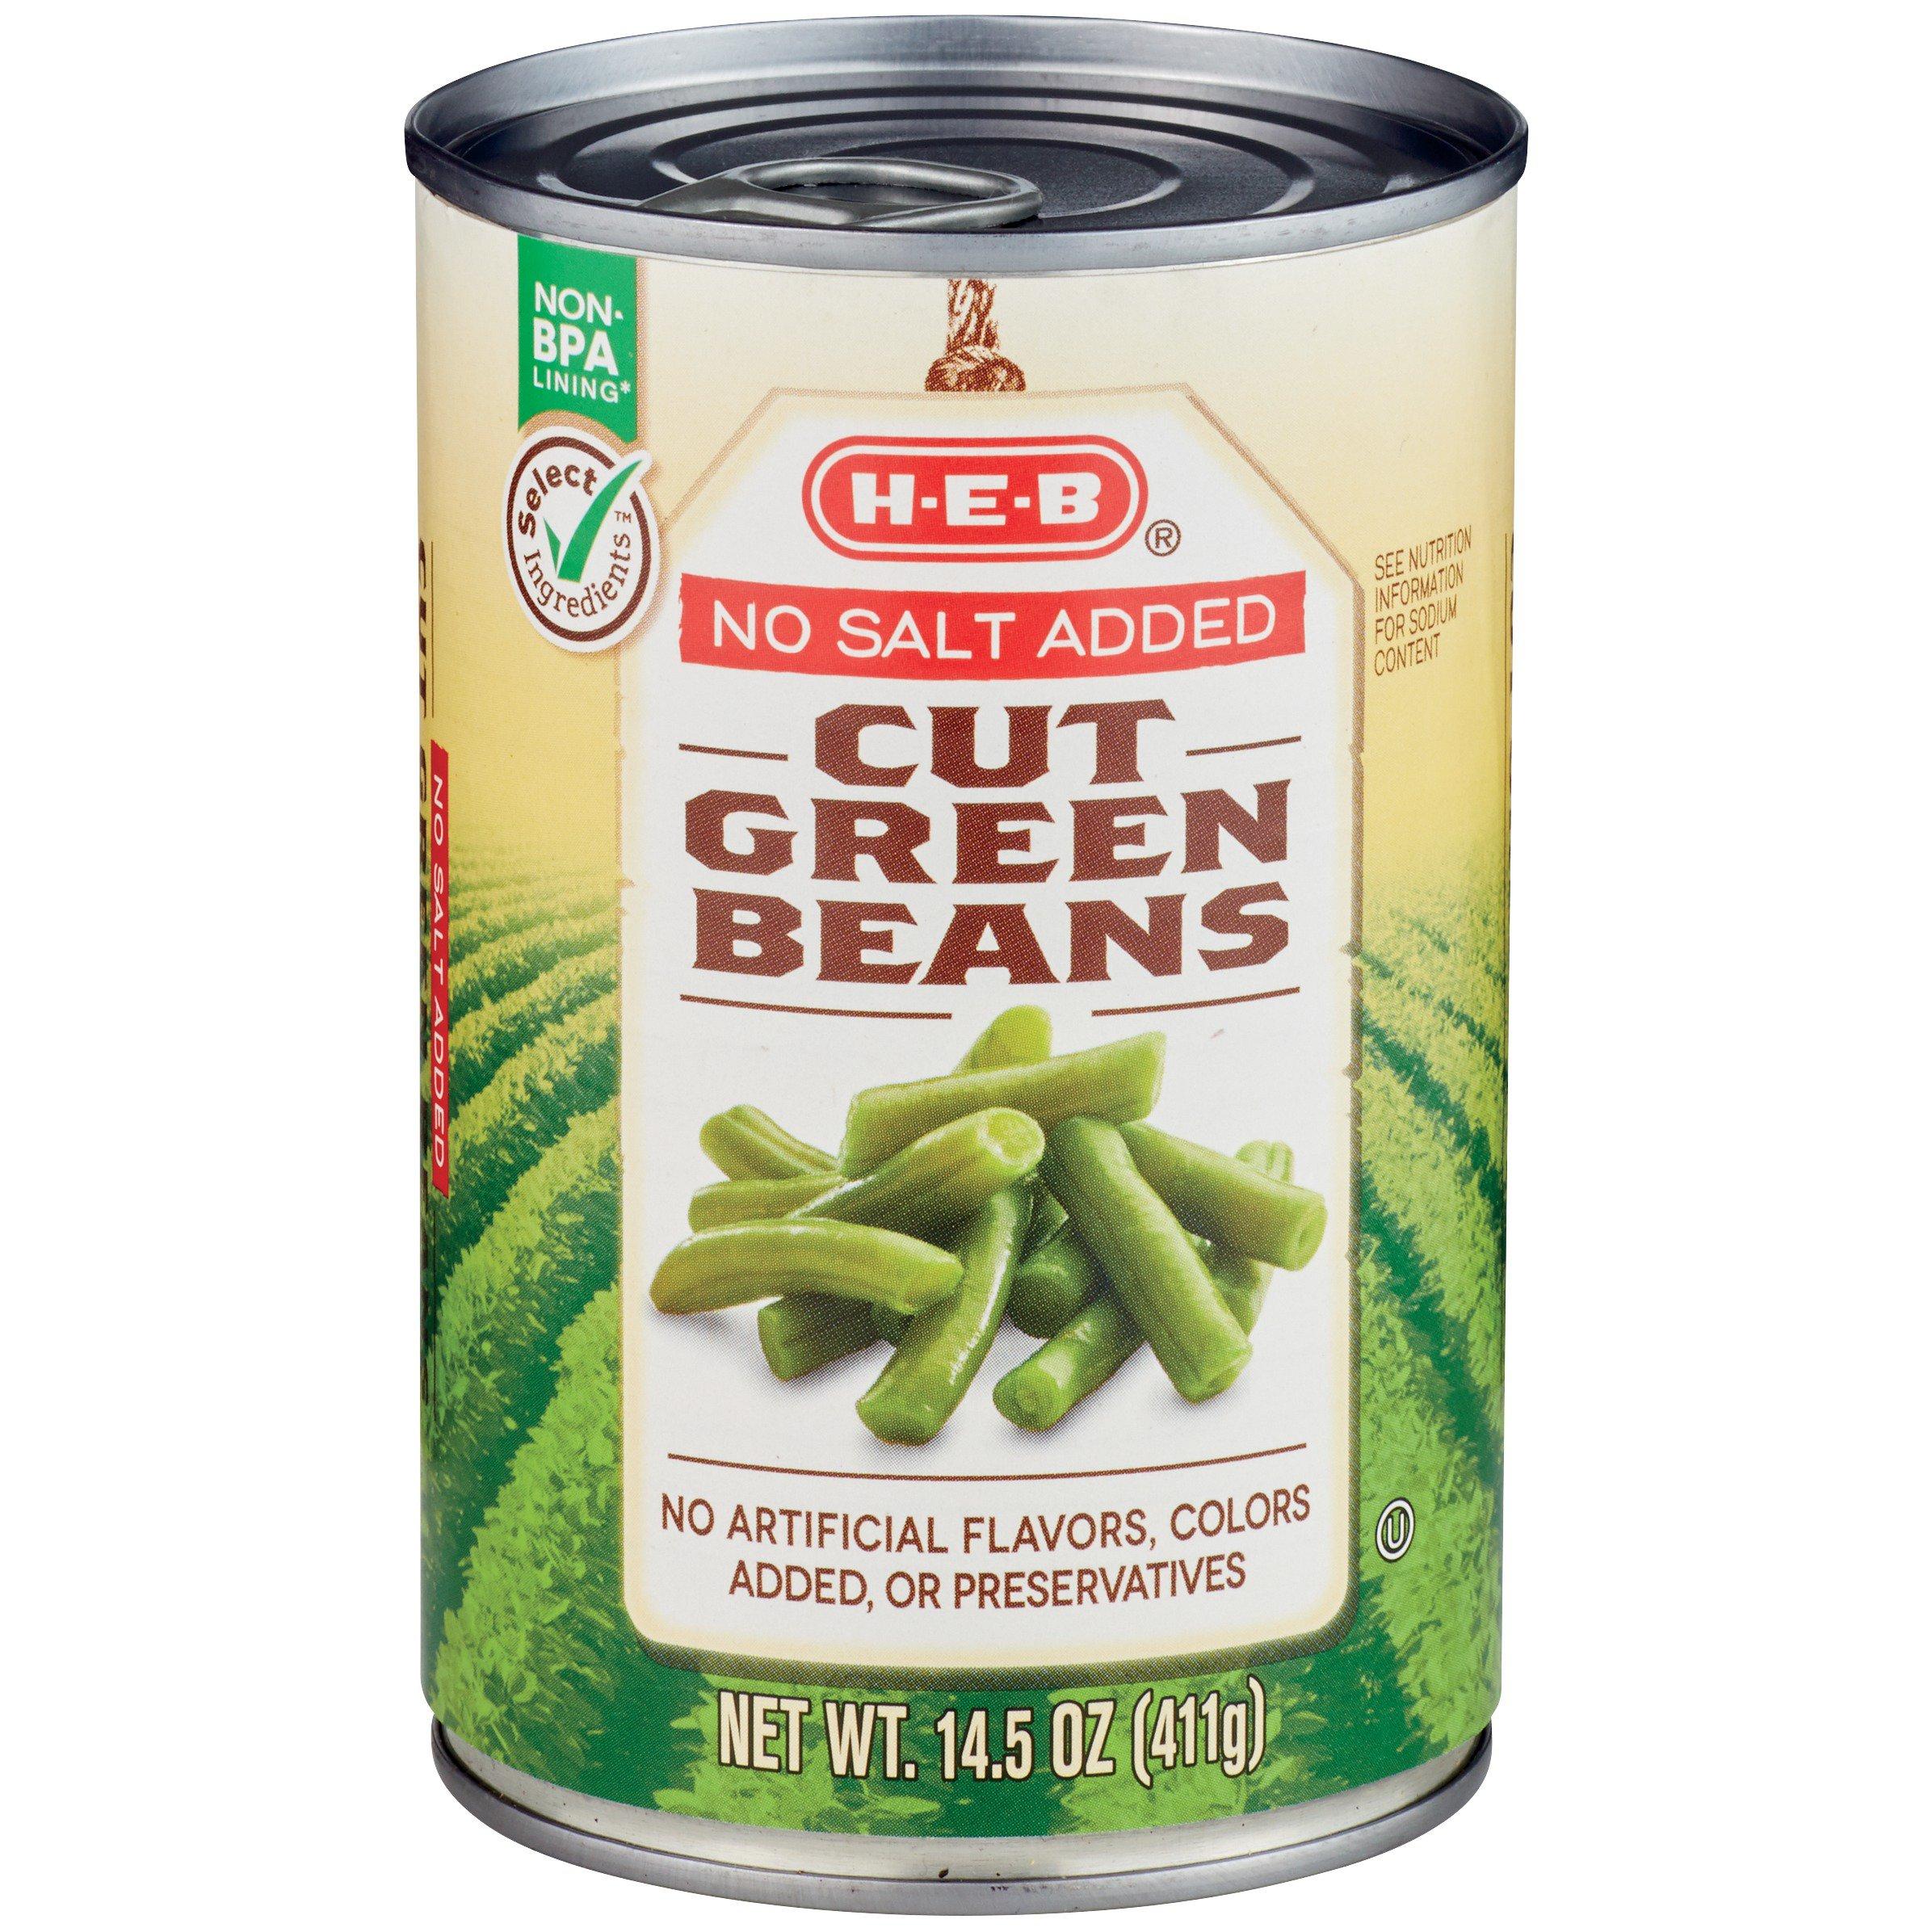 H E B Select Ingredients No Salt Added Cut Green Beans Shop Vegetables At H E B